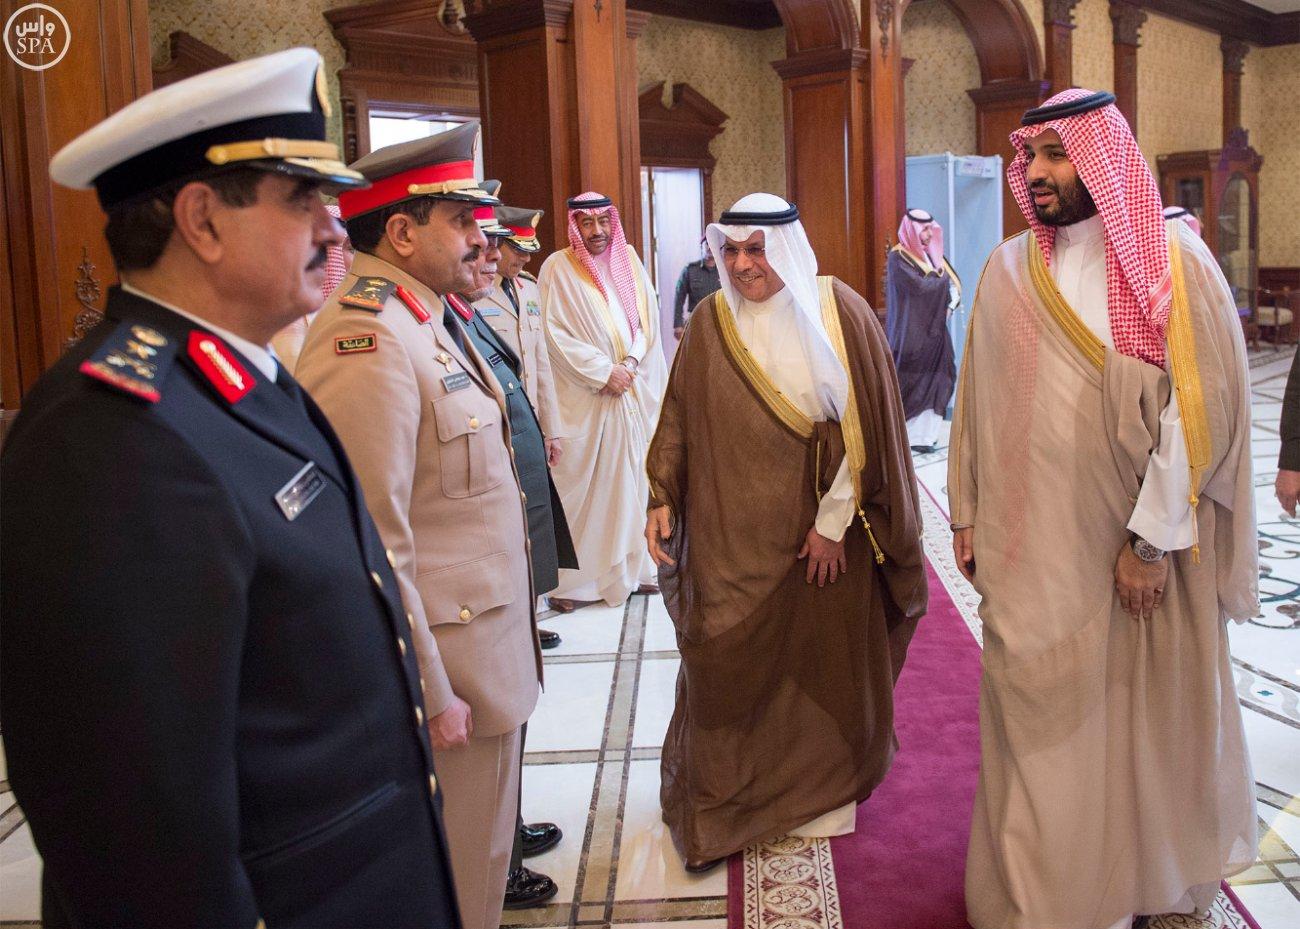 Saudi Arabia's Minister of Defense Prince Mohammed bin Salman bin Abdulaziz, right, and Kuwaiti Deputy Prime Minister and Minister of Defense Sheikh Khalid Al-Jarrah Al-Sabah. (SPA)